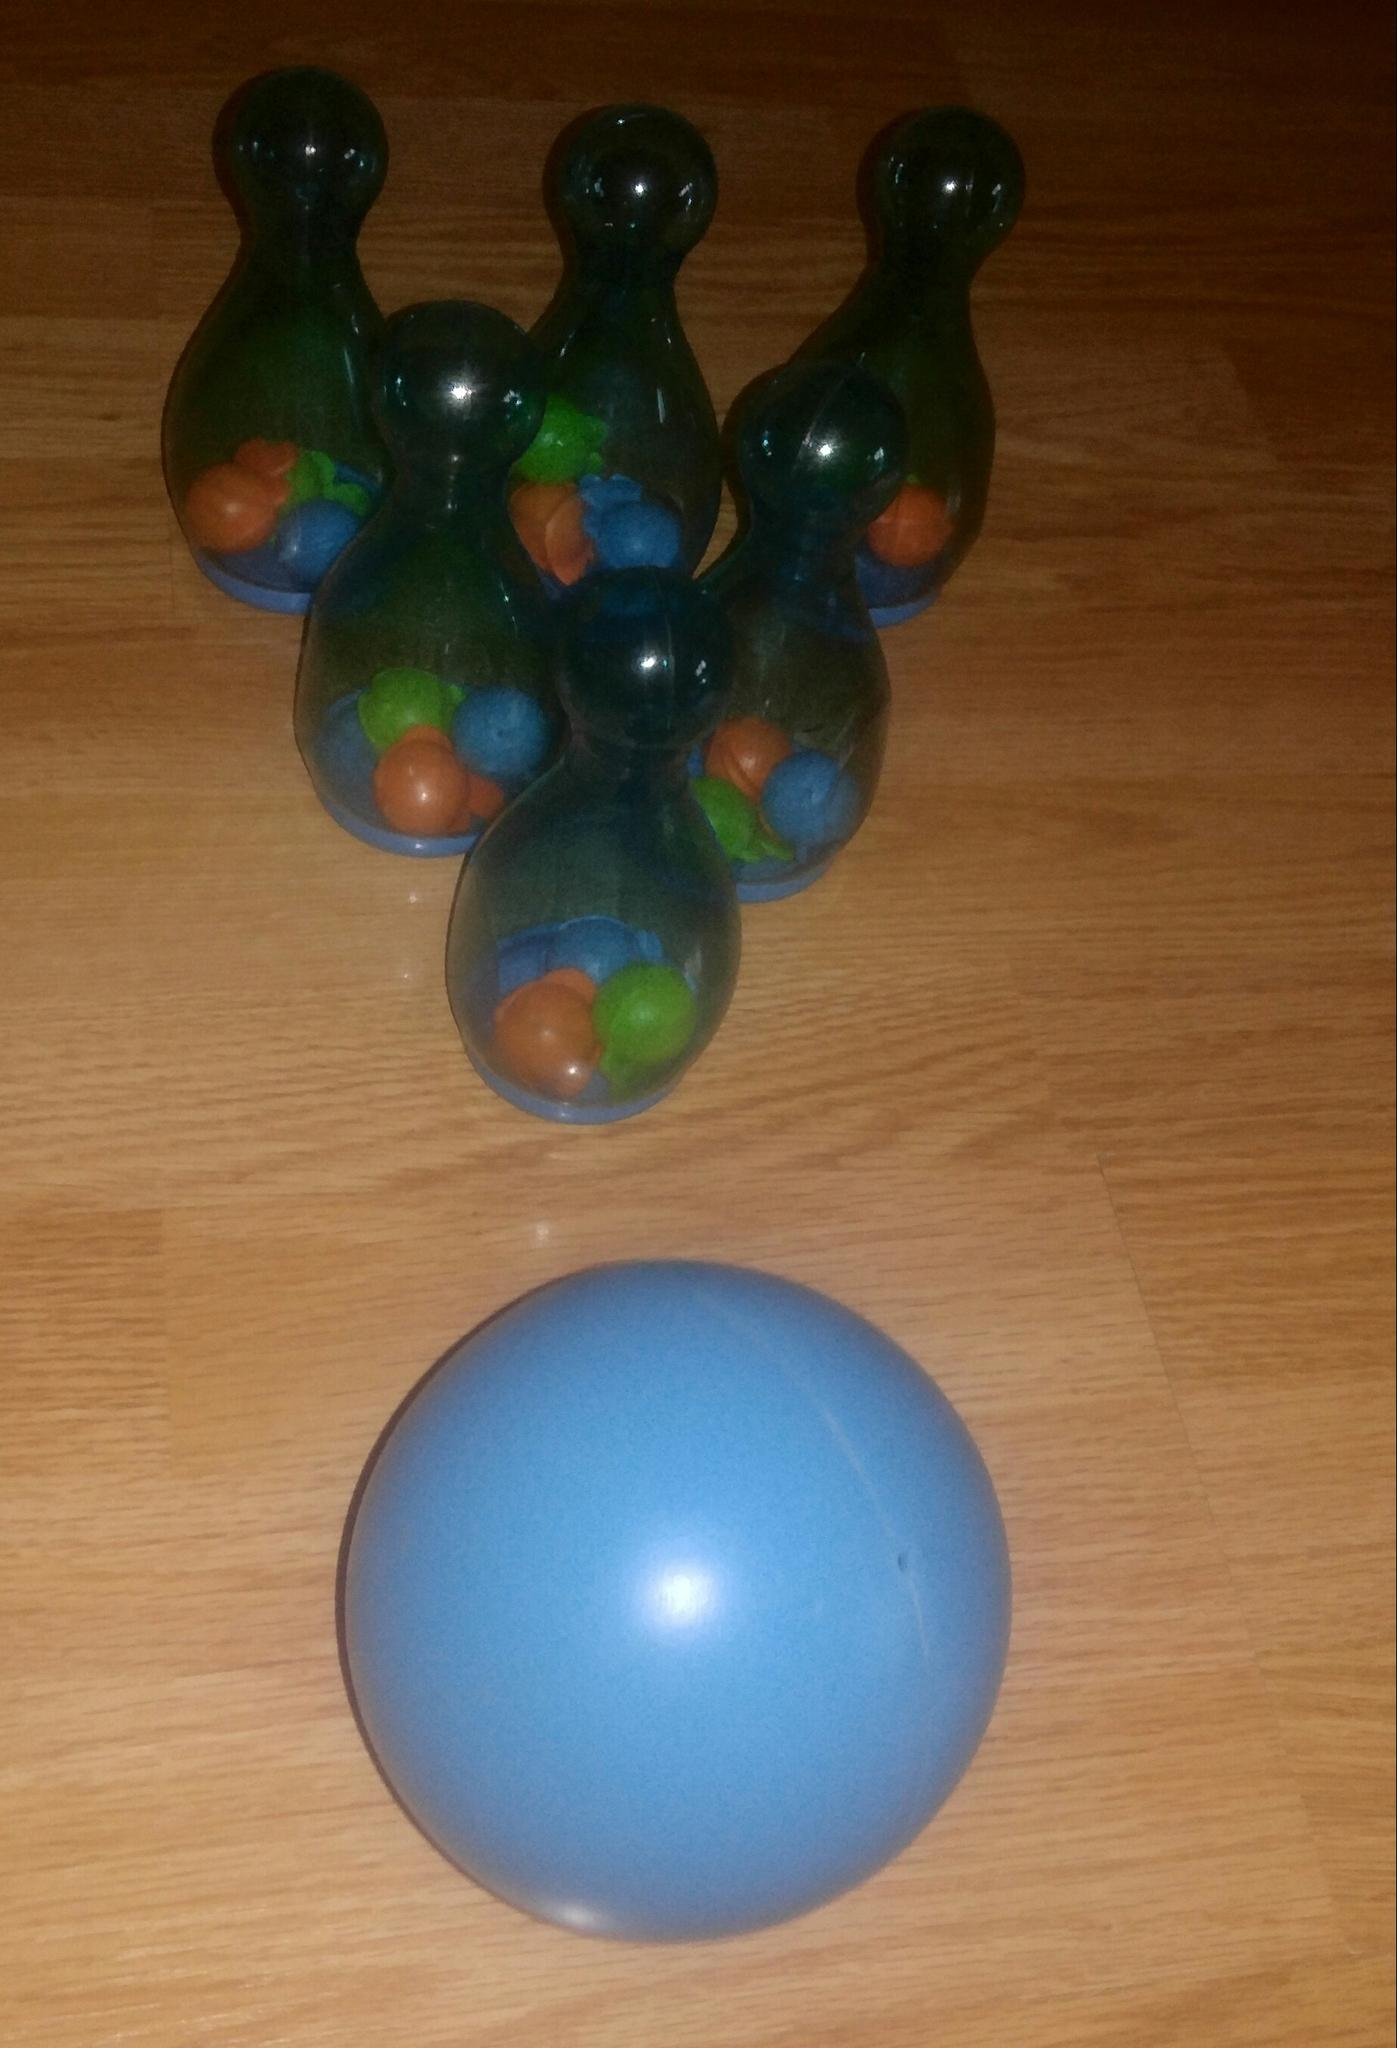 Kidzone 6 Bowling pins and ball